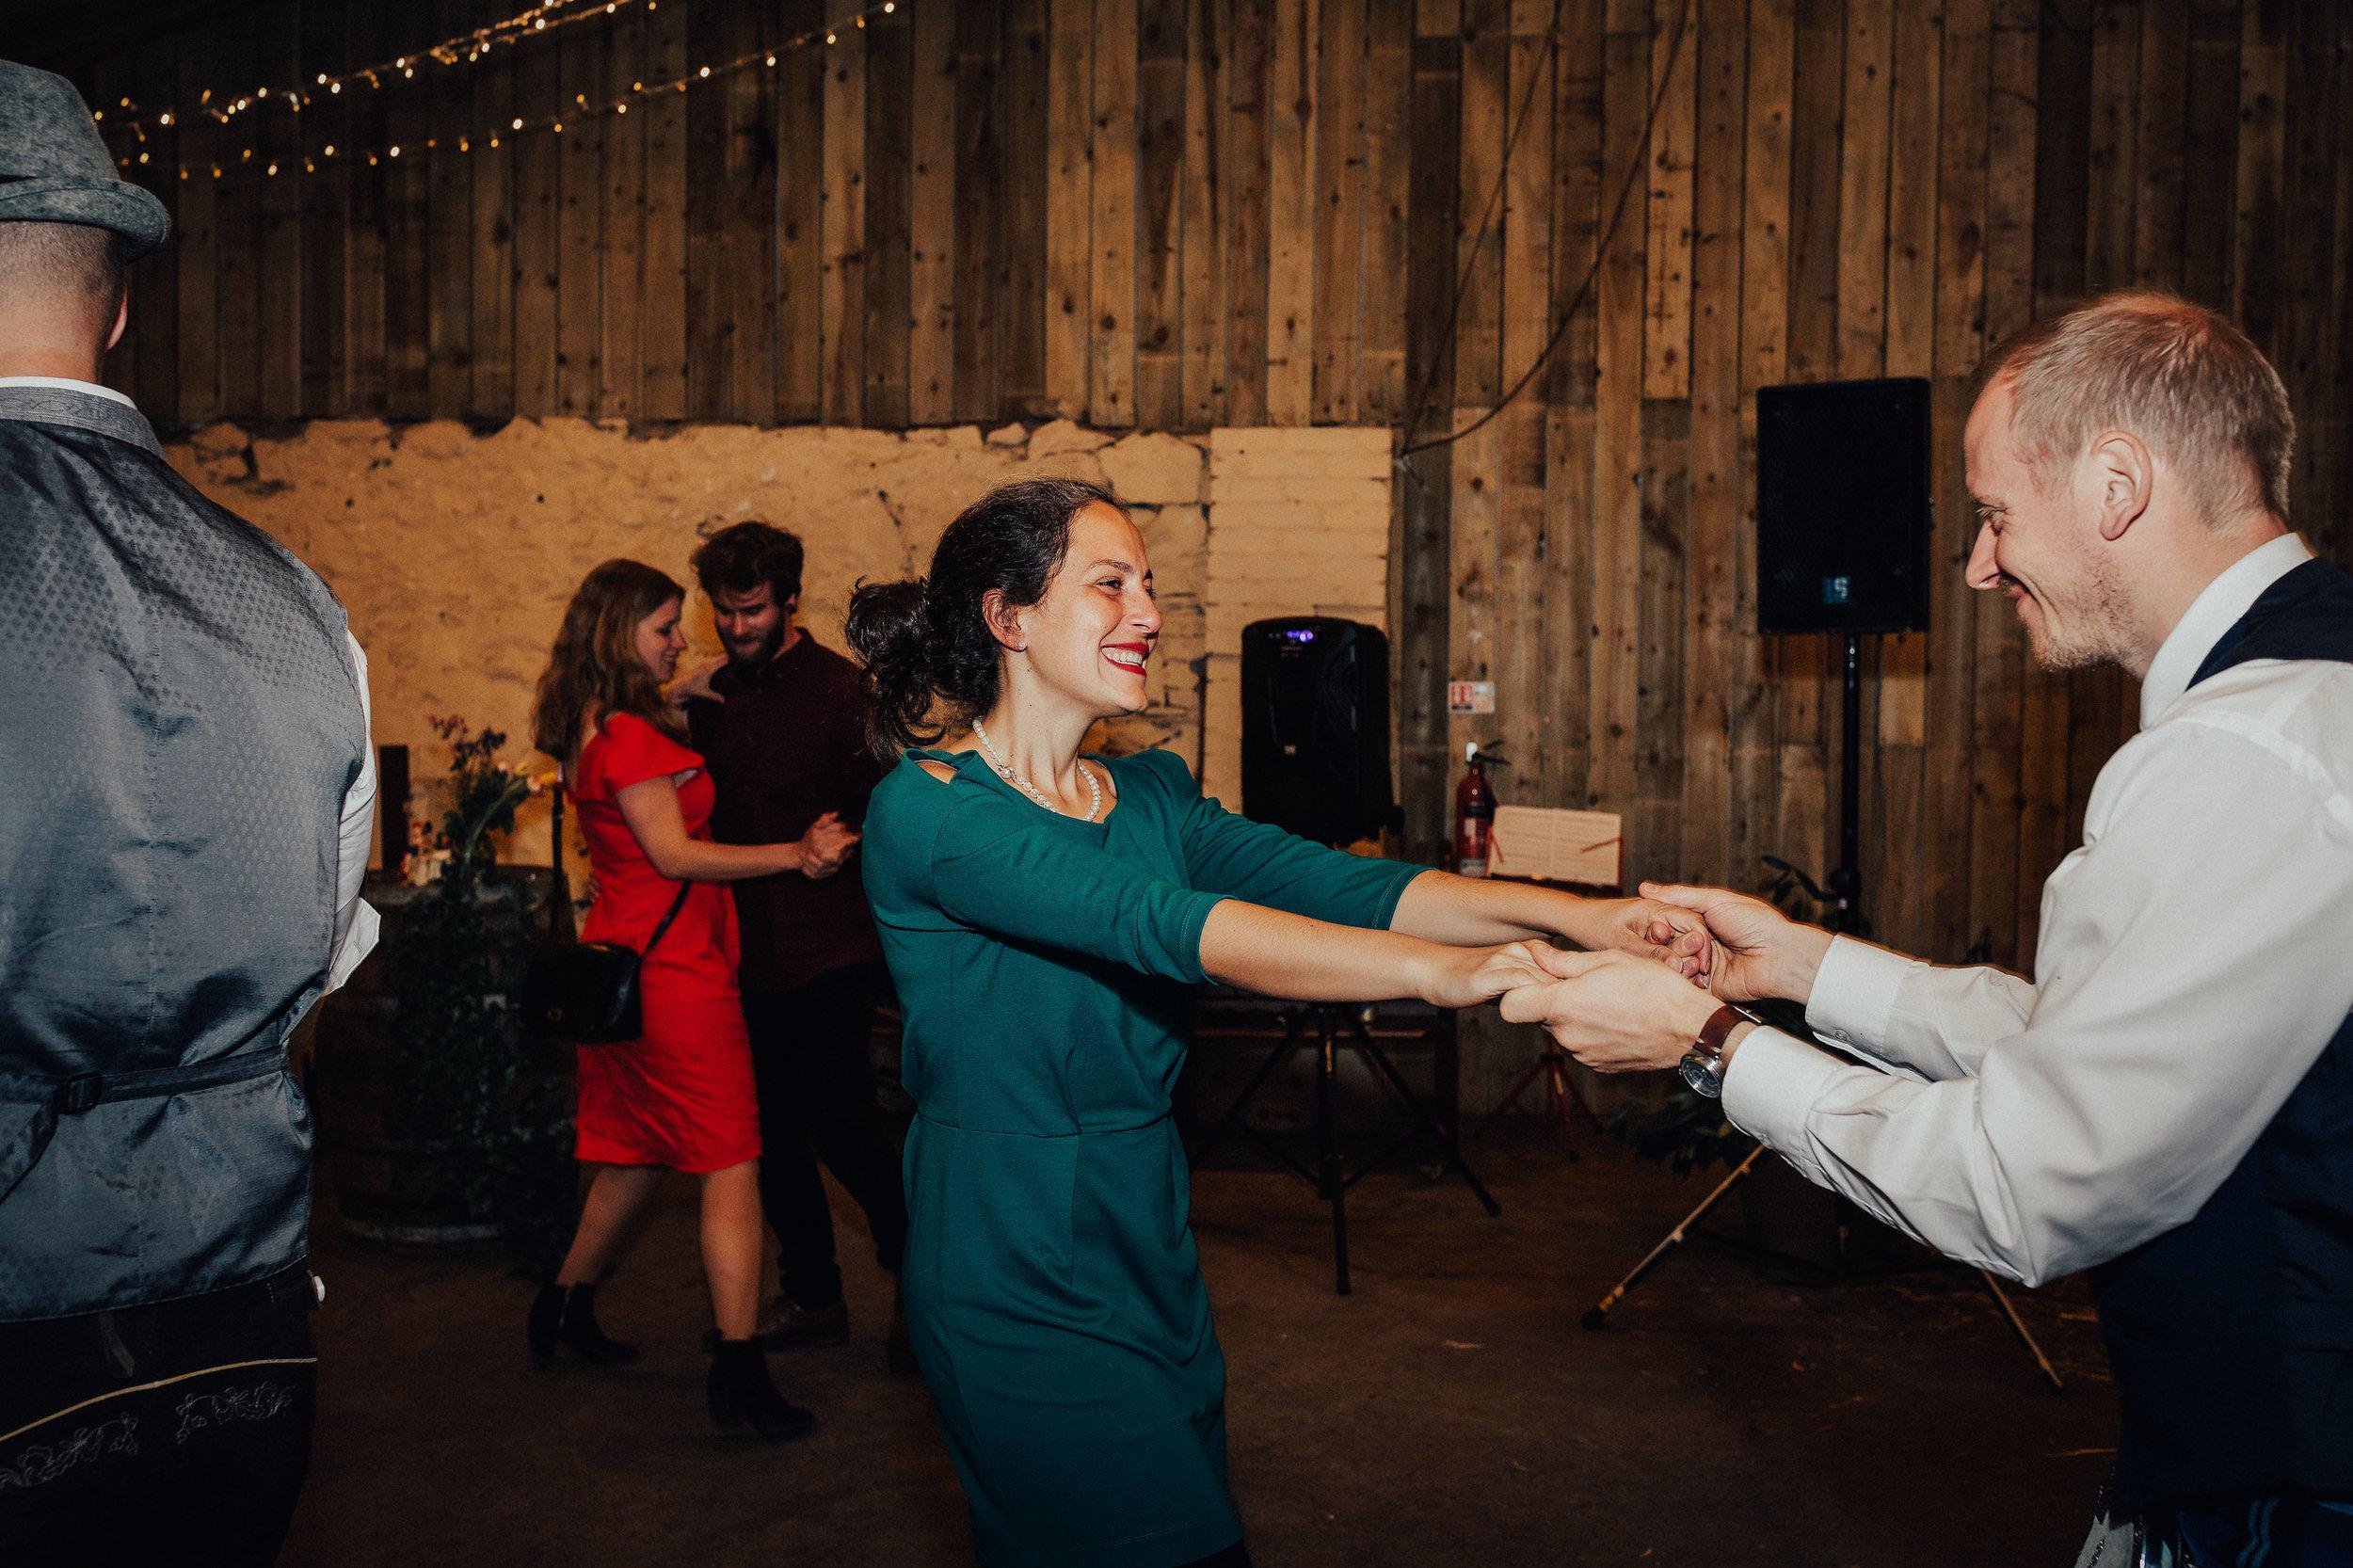 COMRIE_CROFT_WEDDINGS_PJ_PHILLIPS_PHOTOGRAPHY_171.jpg